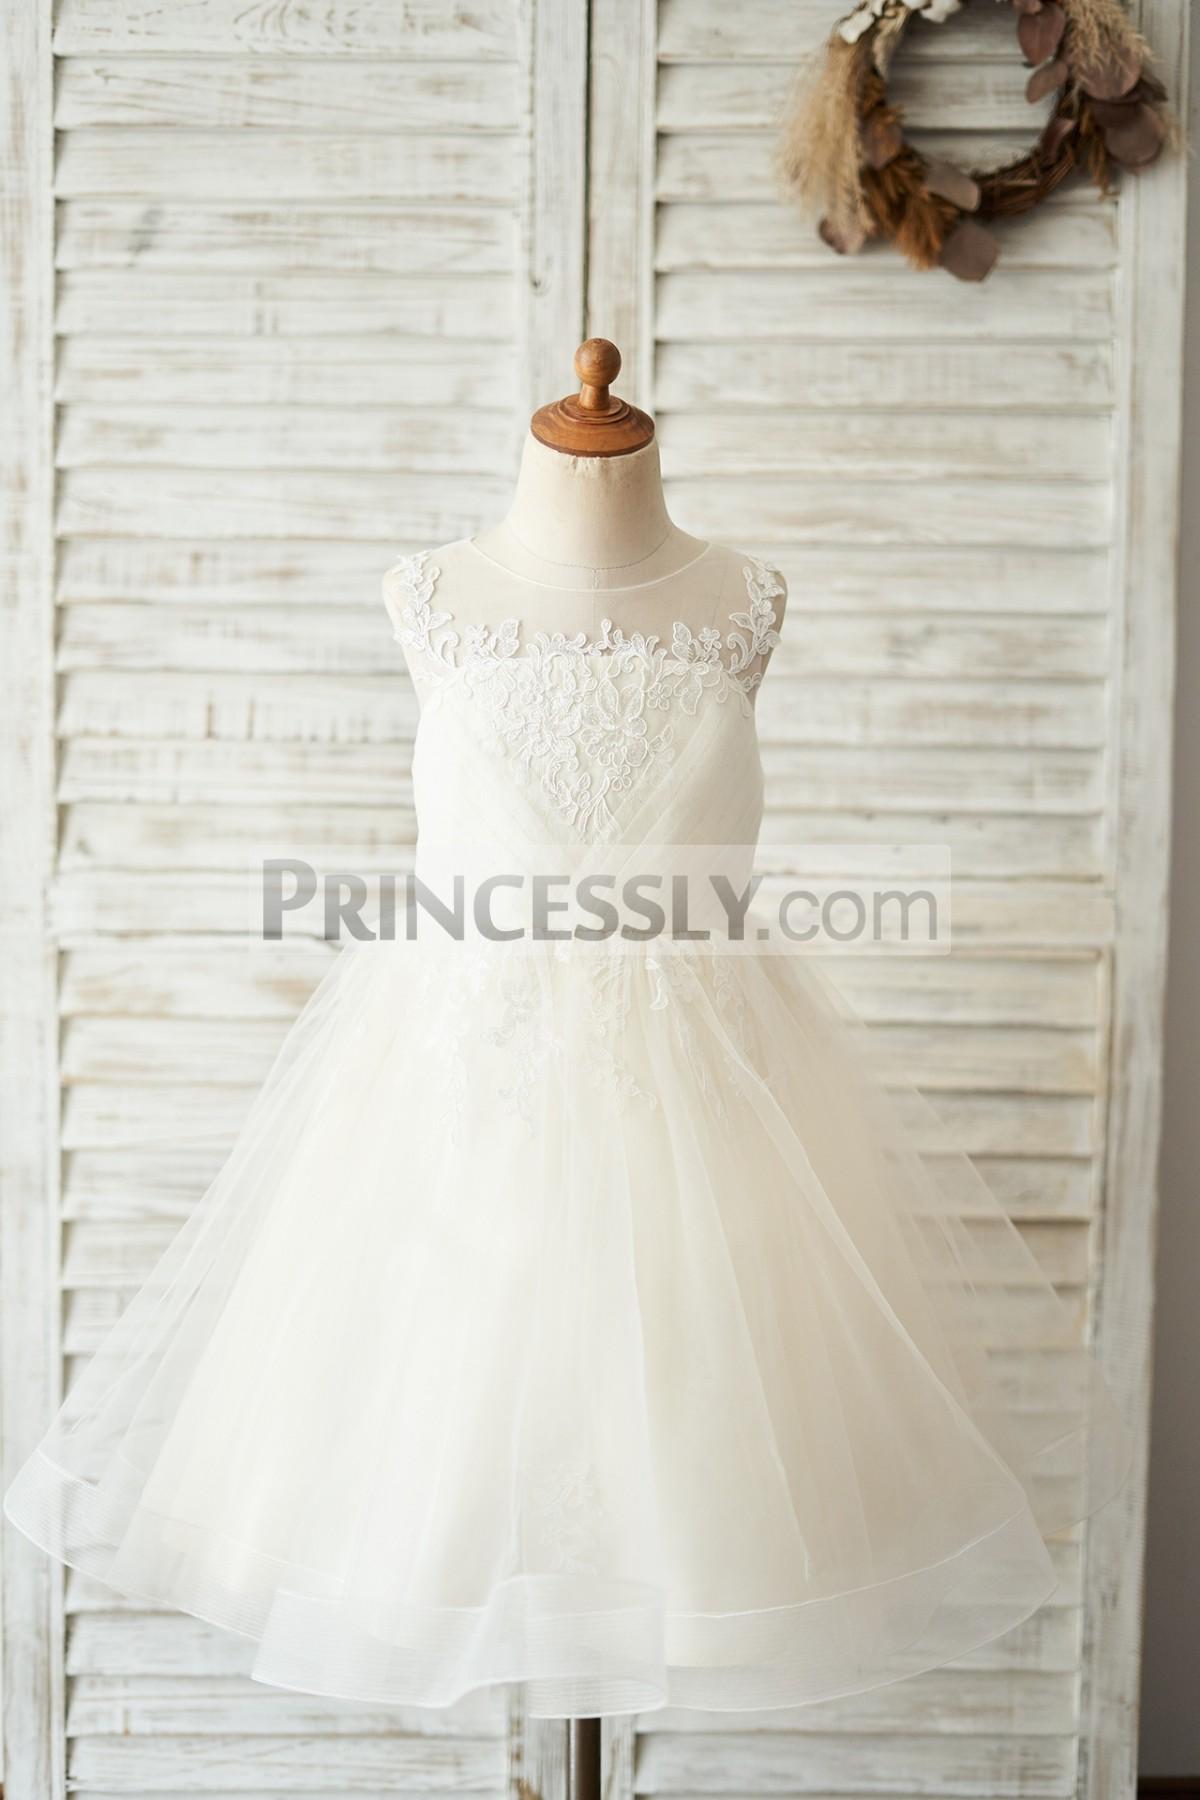 Princessly.com-K1004046-Champagne Lace Tulle Keyhole Back Wedding Flower Girl Dress-31